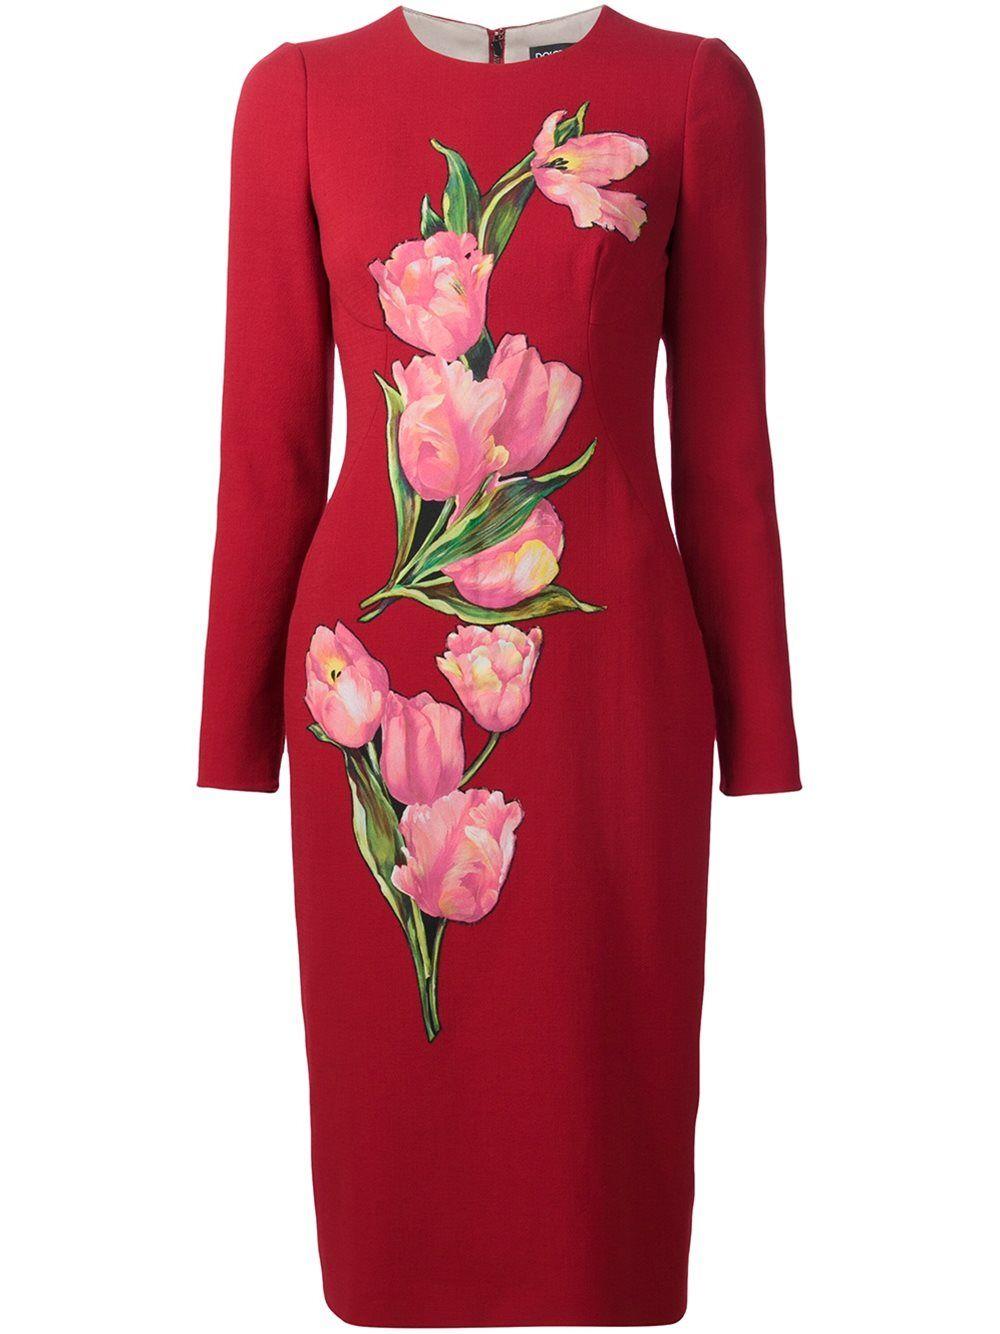 Dolce Gabbana Tulip Print Dress Designer Cocktail Dress African Print Fashion Dresses Red Long Sleeve Dress